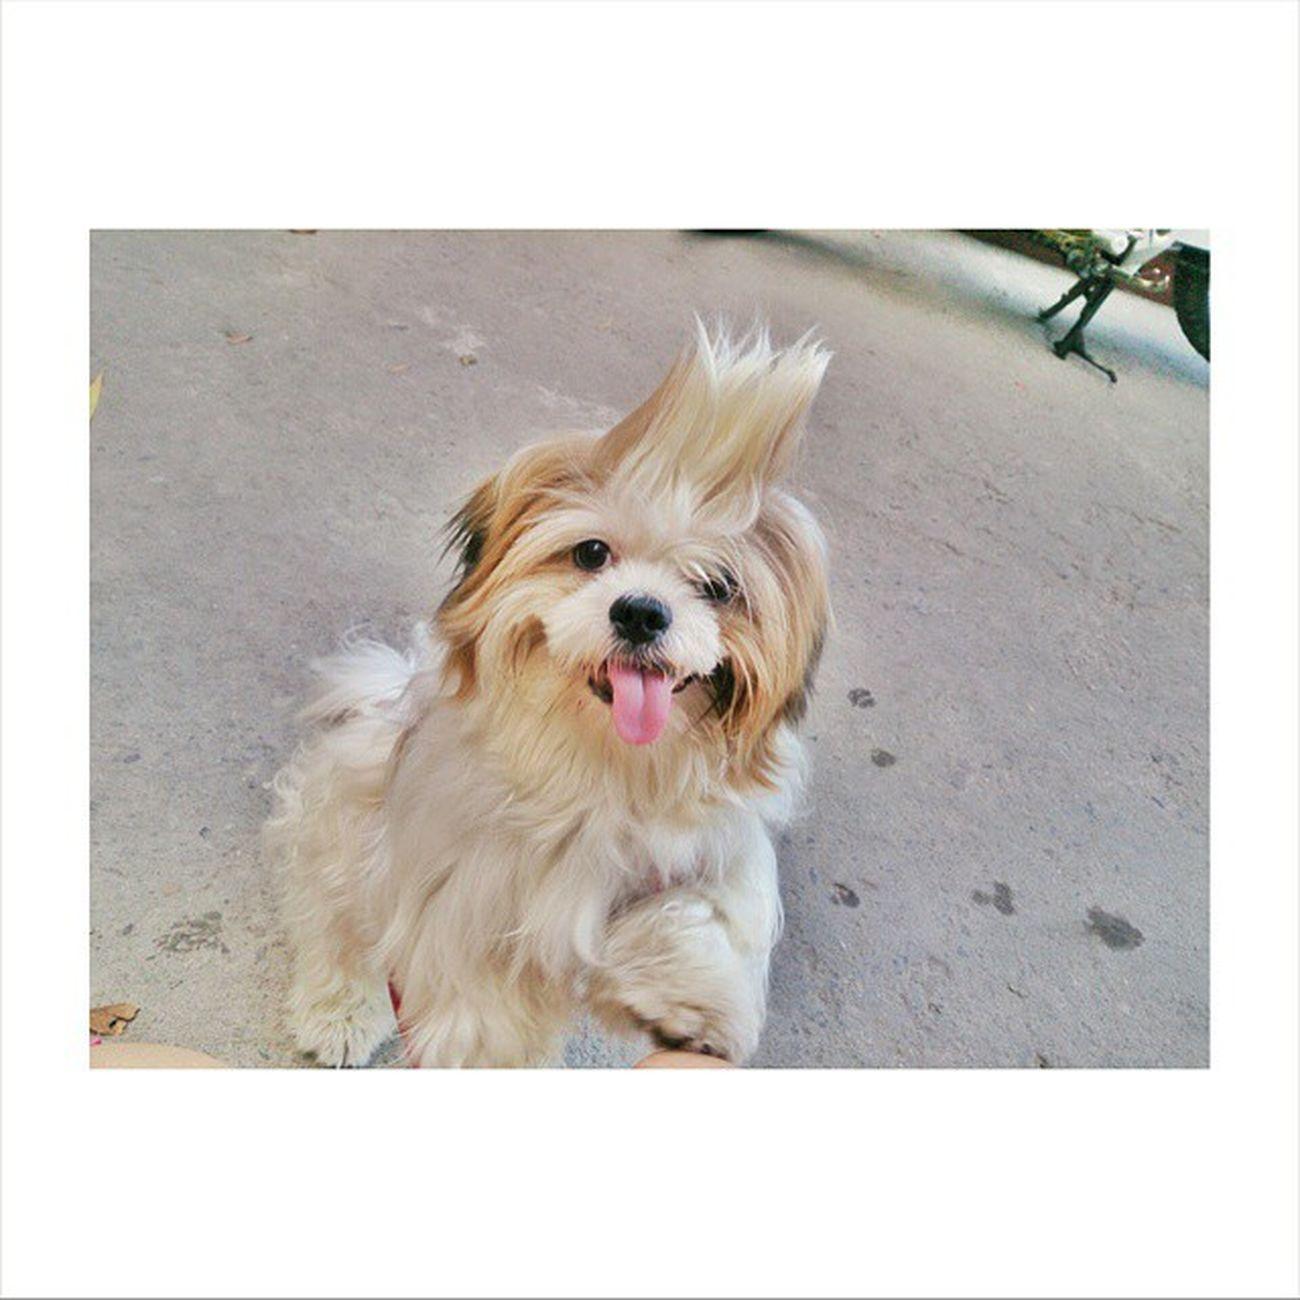 Kahit anung mangyari, you'll always be my baby. Kahit na may dumating na bagong puppy, kahit na chow chow pa sya. 😊 My KobeBebe 🐶. My Furball 🐕. My Firstbaby 😍 My LivingTeddyBear